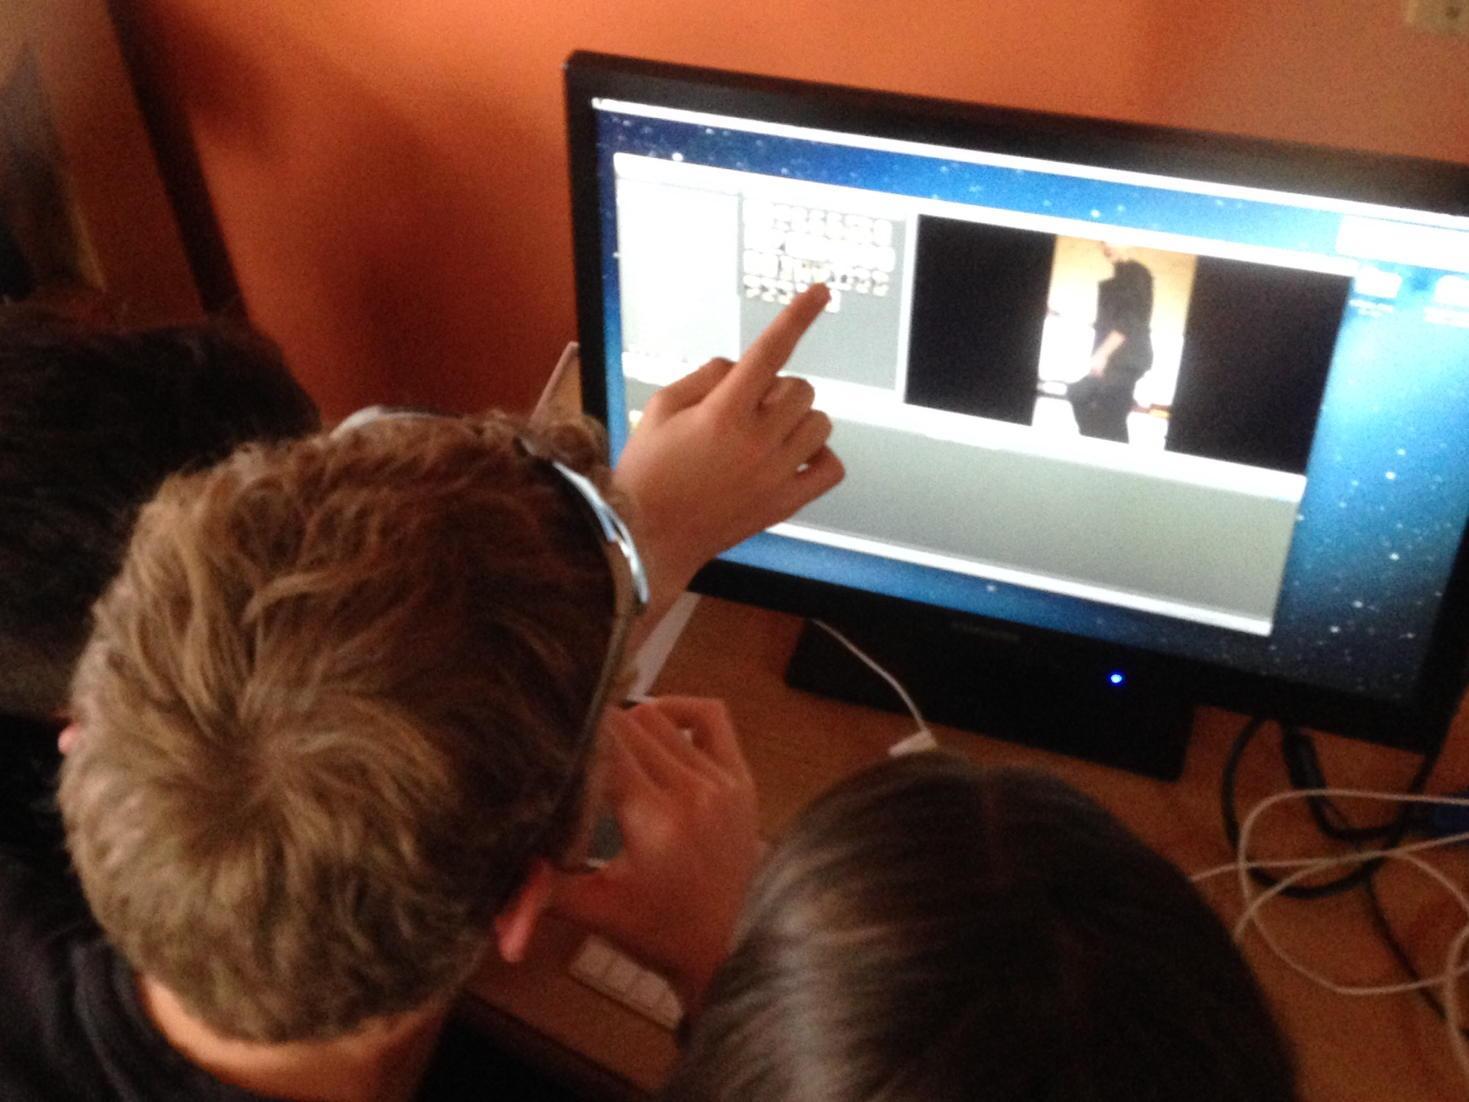 More Film Editing this eve #Connemara Maths Academy #SummerCamp @GalwayHour @MayoHour #Ireland http://t.co/dB6MTG8EII